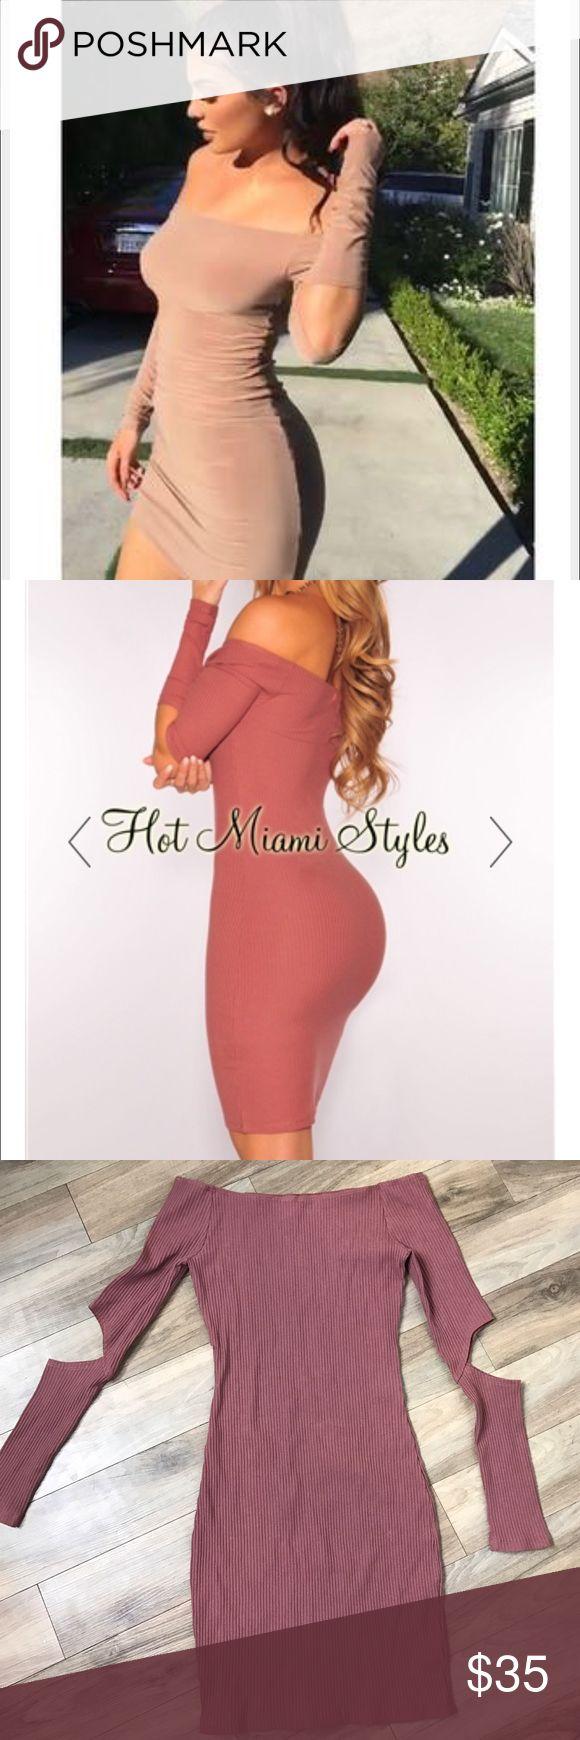 Hot Miami styles mauve dress small Hot Miami styles mauve dress small off the shoulder with cut outs Hot miami styles Dresses Mini